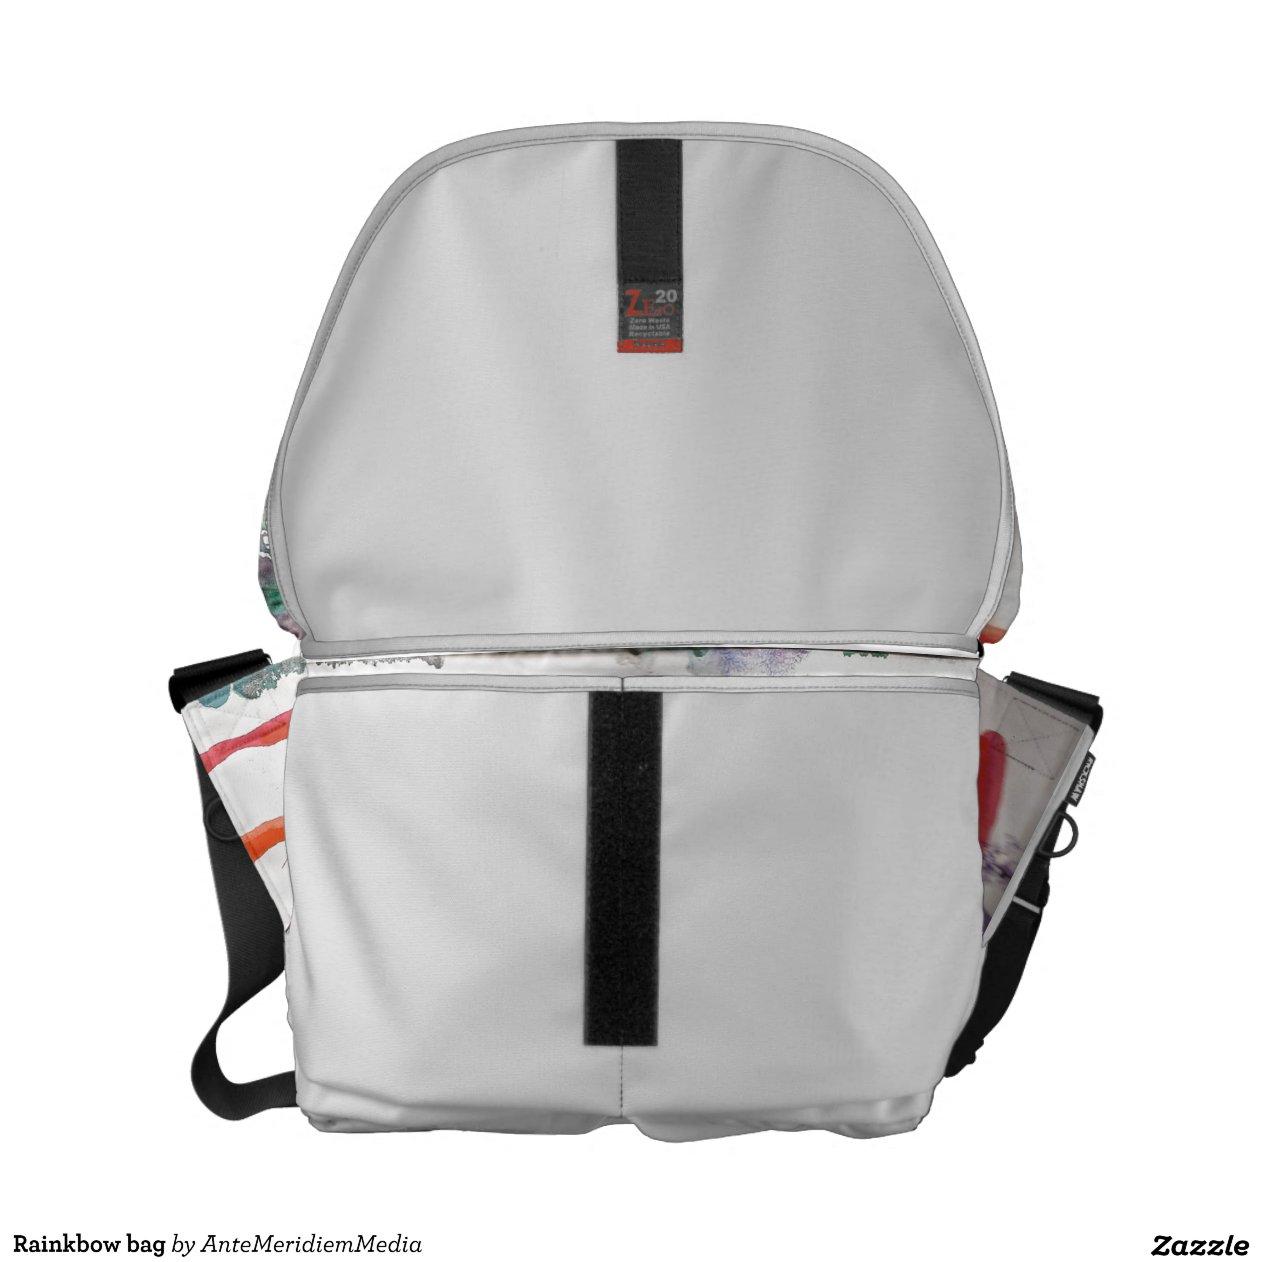 Kawaii Bow Bag Rainkbow Bag Messenger Bags Rcfafcefeeadbe Zkhf Byvr